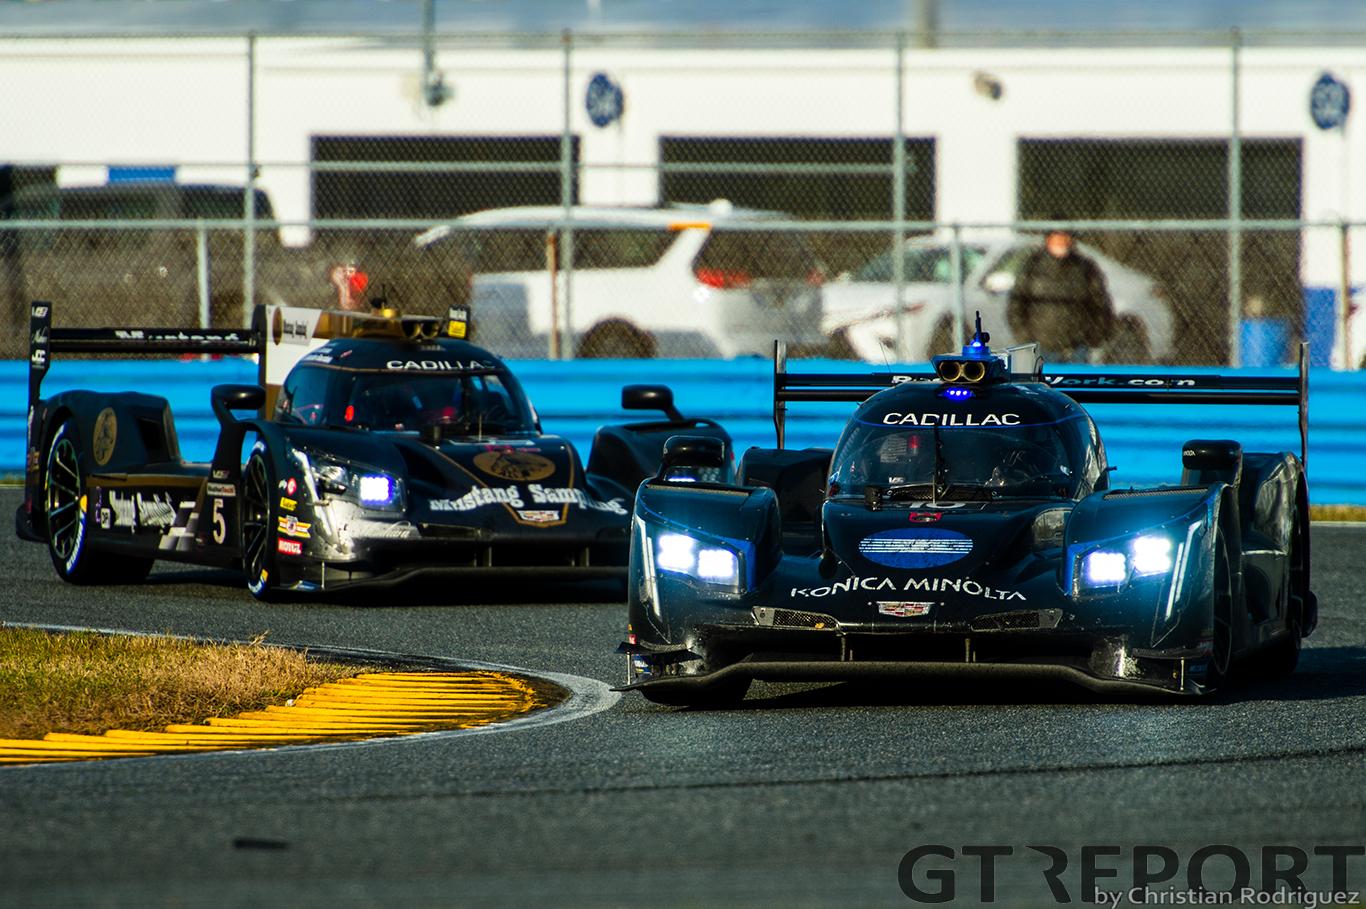 Daytona 24 Hours: Wayne Taylor racing overcomes penalty to lead into final stretch